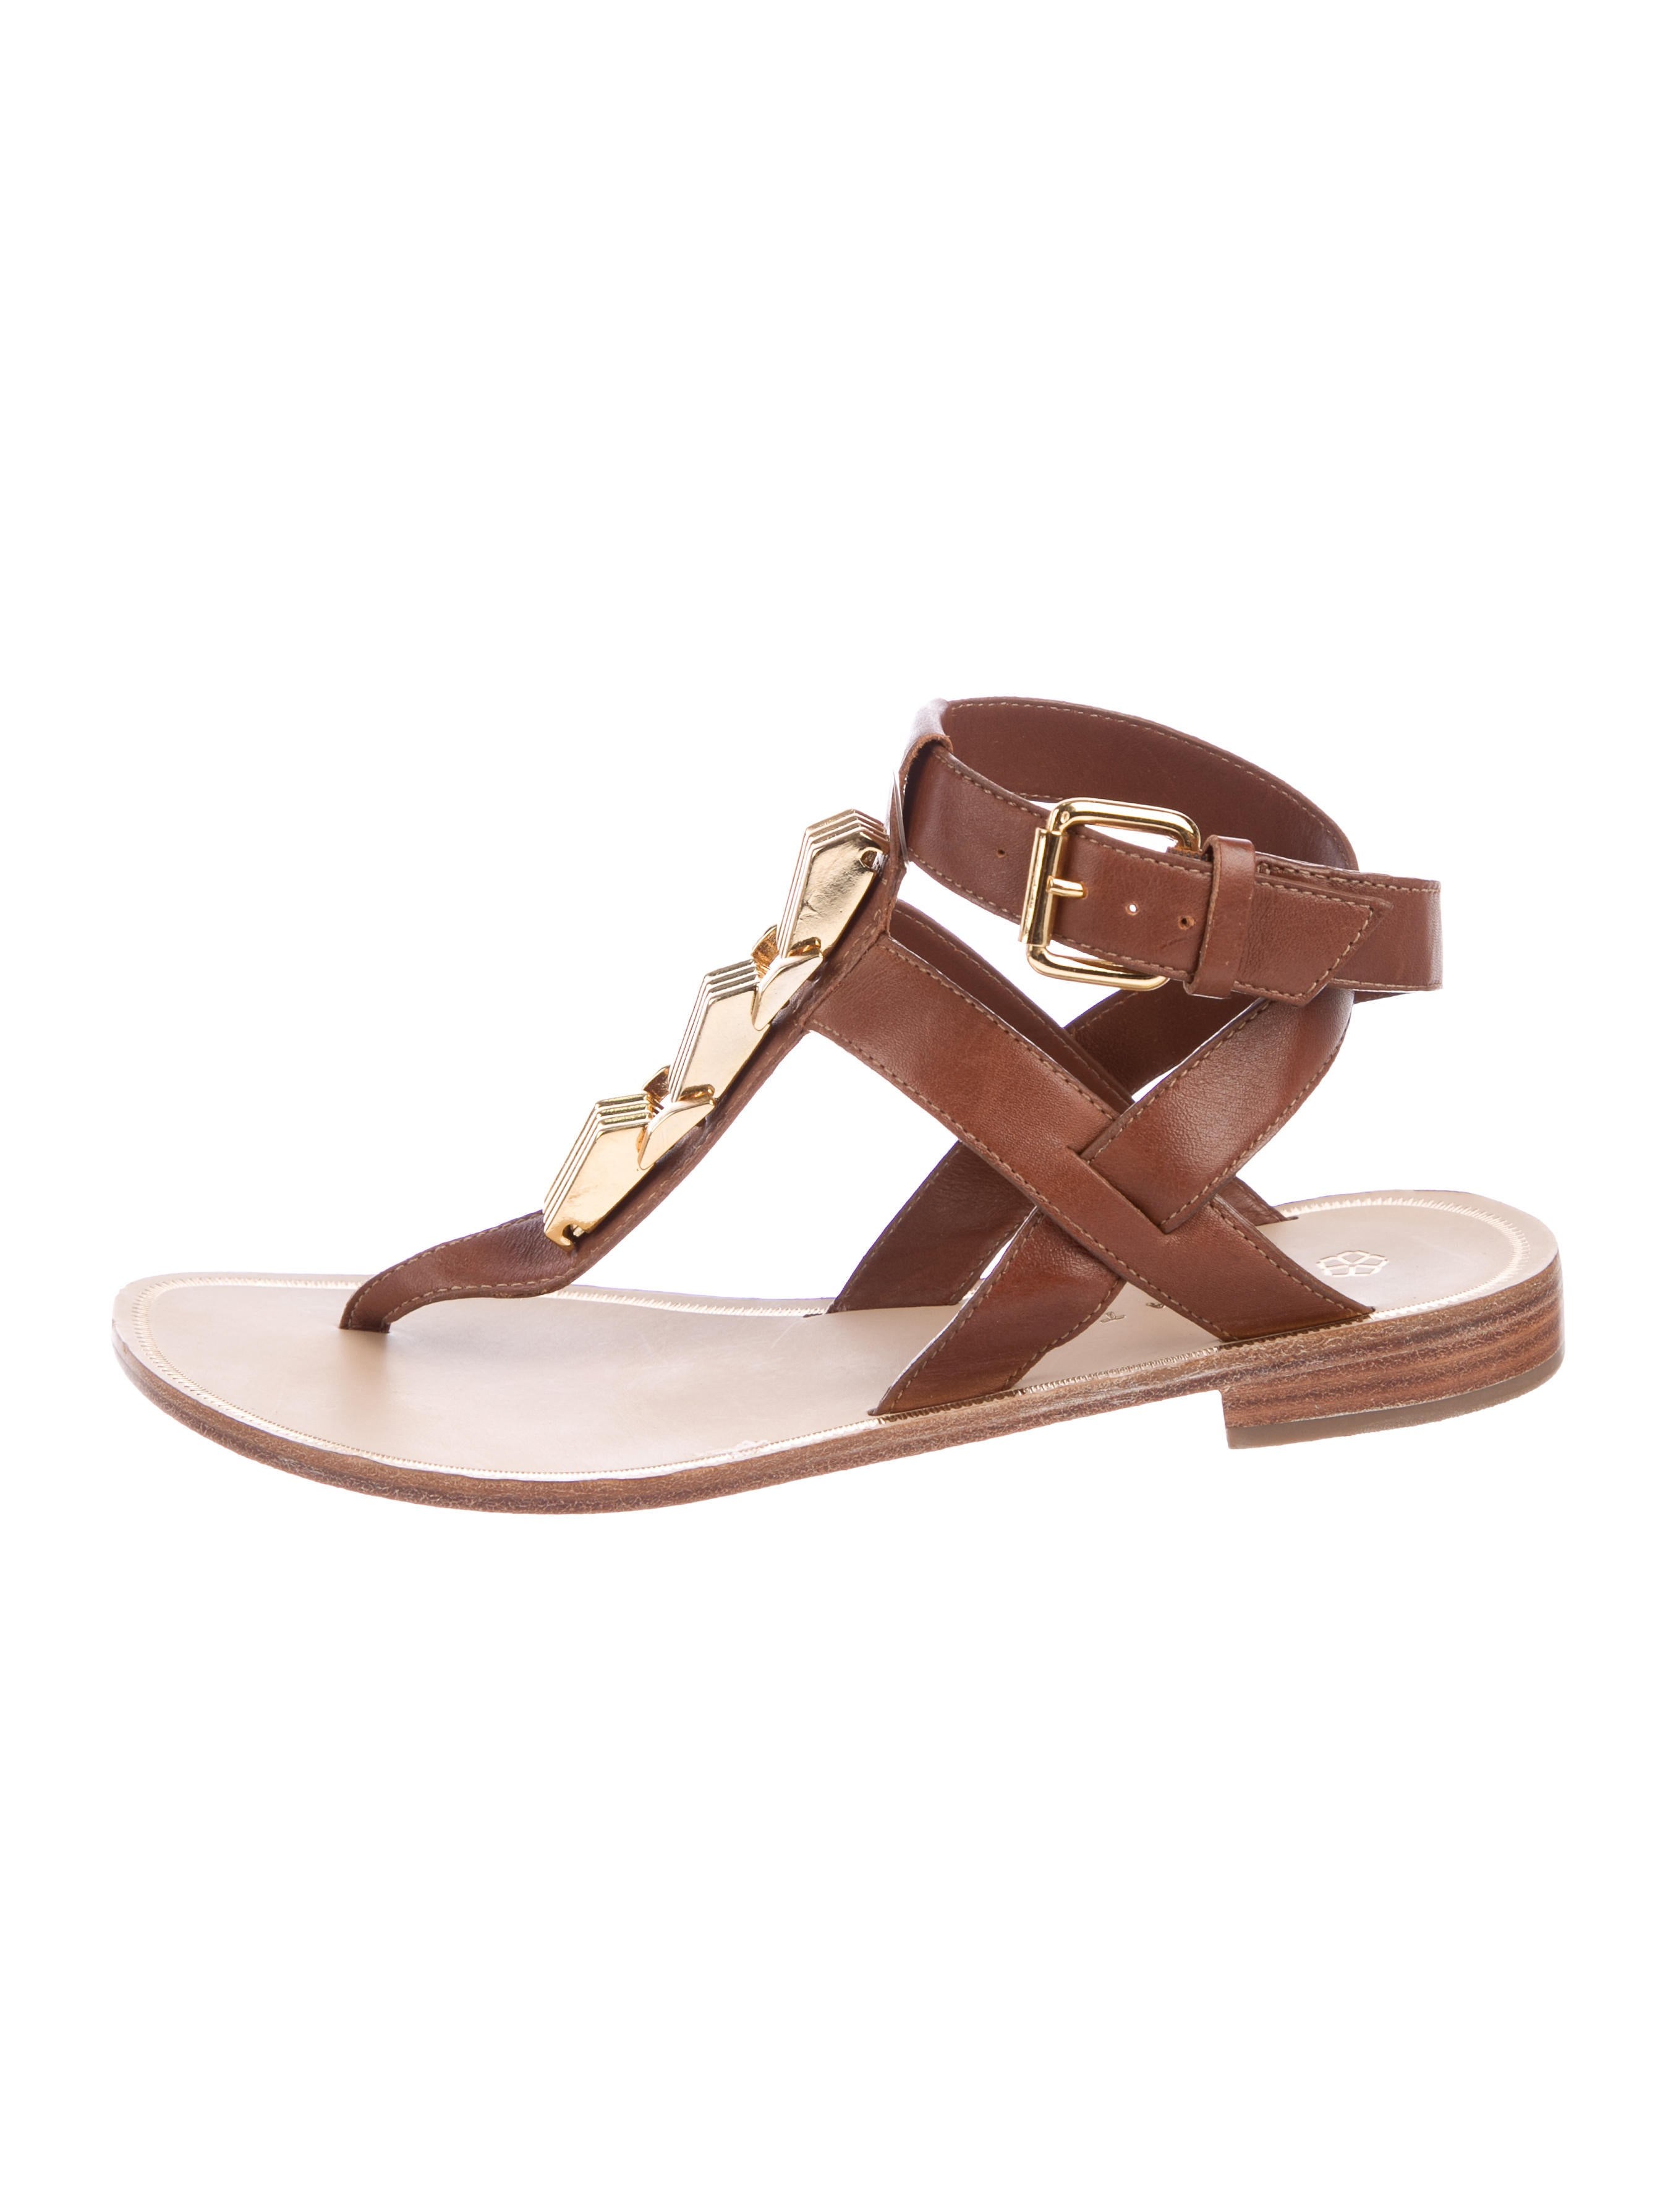 Trina Turk Leather Baker Sandals free shipping ebay 6hBJbOckfD